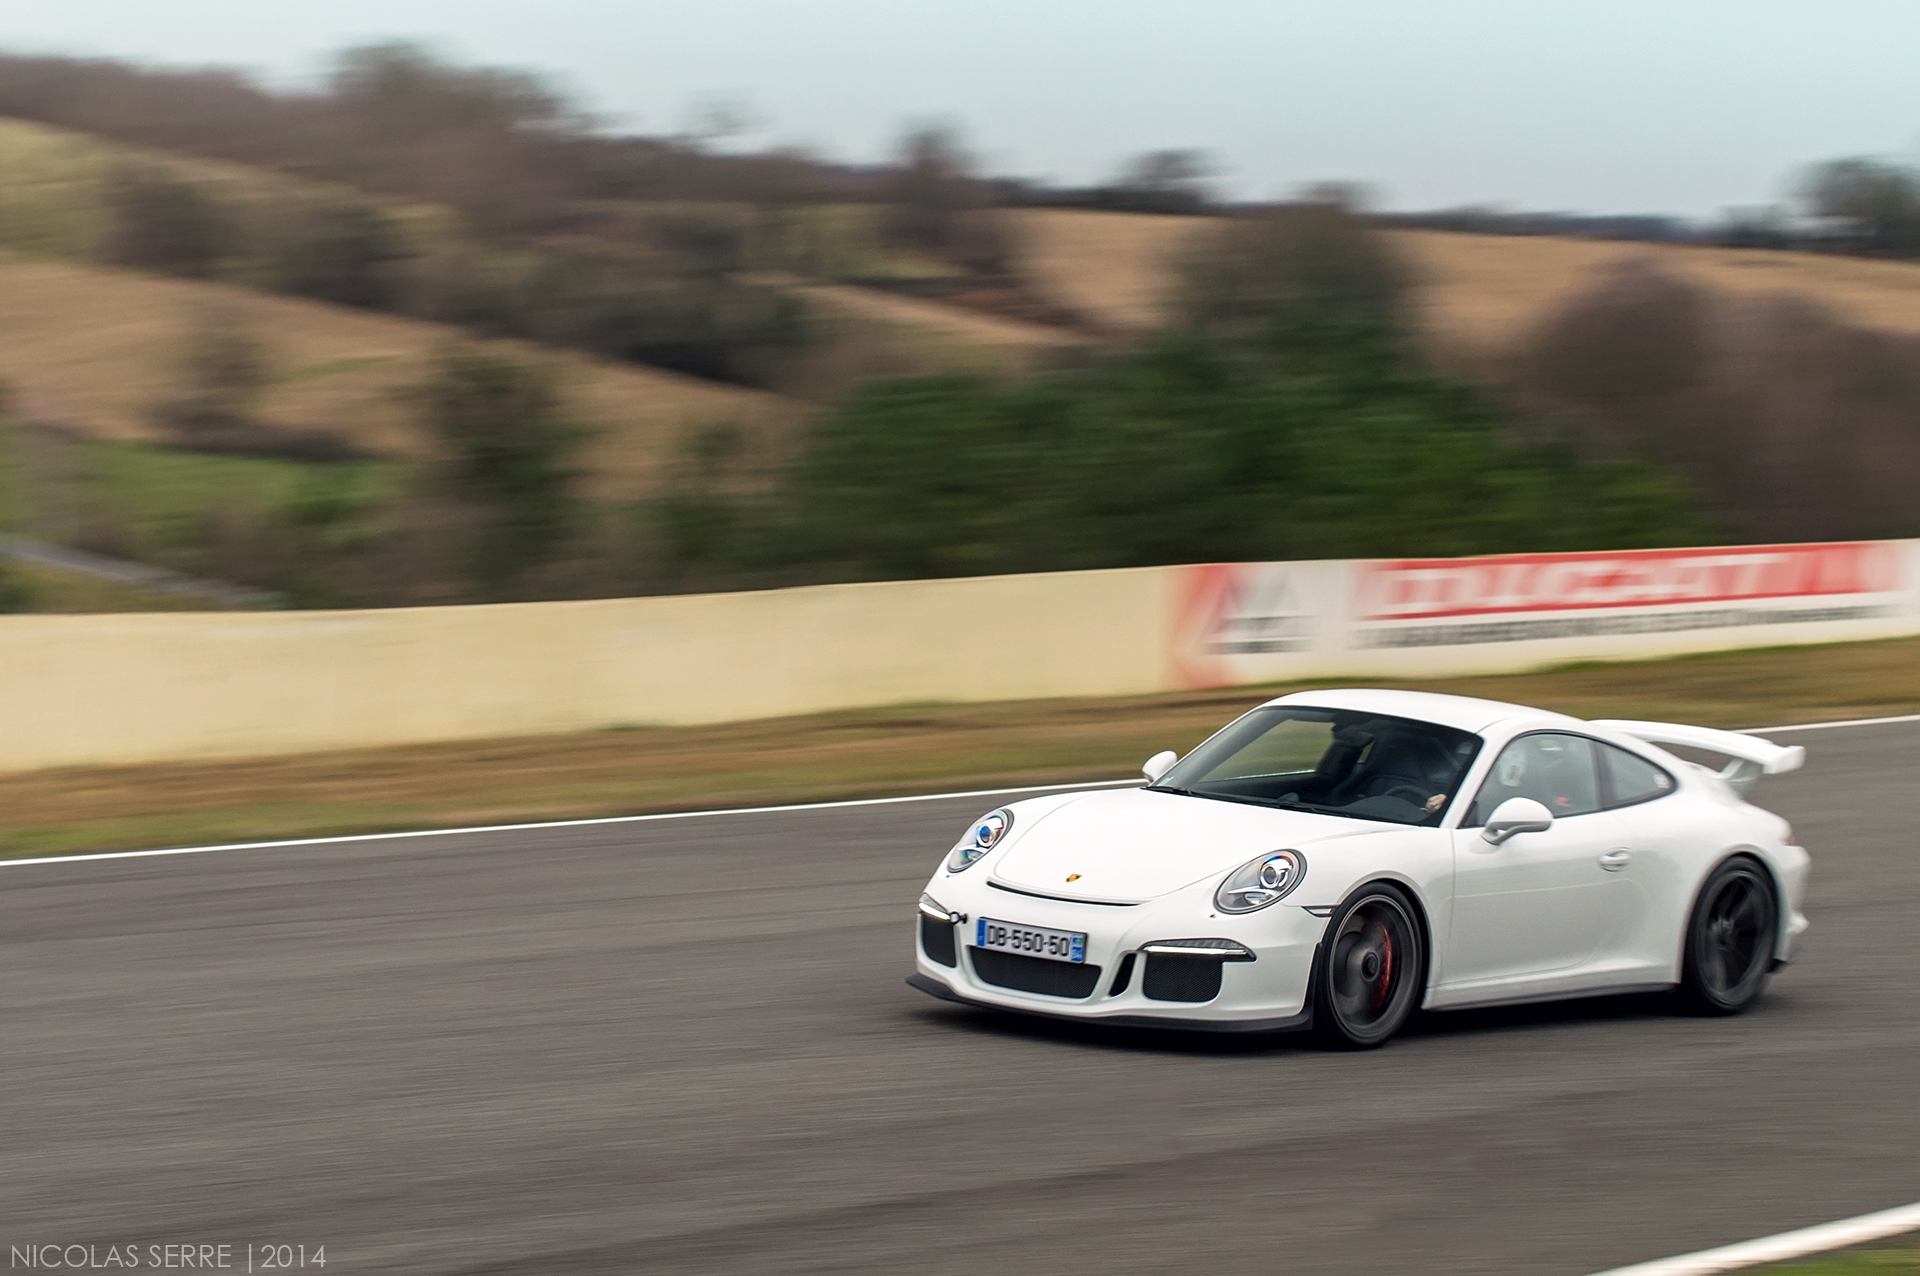 File:Porsche 911 GT3 ( 991 ) - Track Day ASA + GTRO - (12055983175 on laferrari on track, mclaren p1 on track, lotus exige on track, audi r8 on track, bugatti veyron on track, maserati mc12 on track, mclaren f1 on track, ford gt40 on track, hyundai genesis coupe on track, pagani zonda on track, lamborghini aventador on track, jeep wrangler on track, ford gt on track, lamborghini diablo on track, dodge viper on track, ferrari testarossa on track, hennessey venom gt on track, lamborghini gallardo on track, lamborghini sesto elemento on track, ferrari mondial on track,